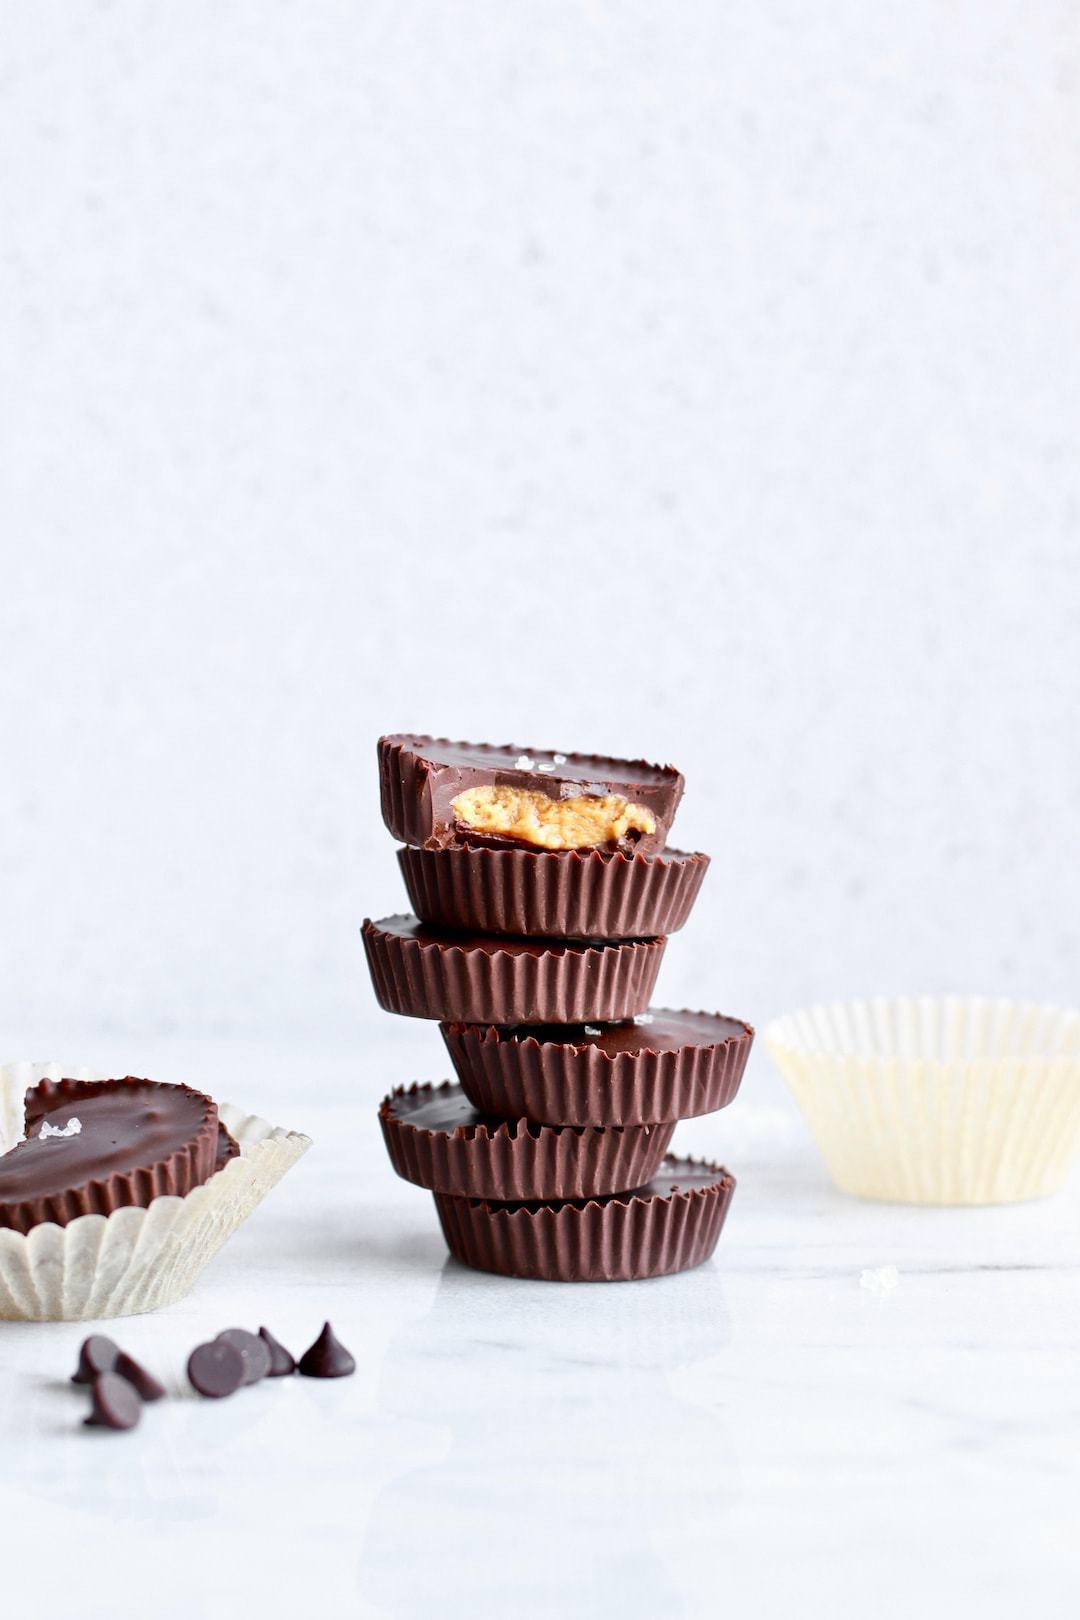 12 Super Easy Plant Based Desserts - Vegan Peanut Butter Cups